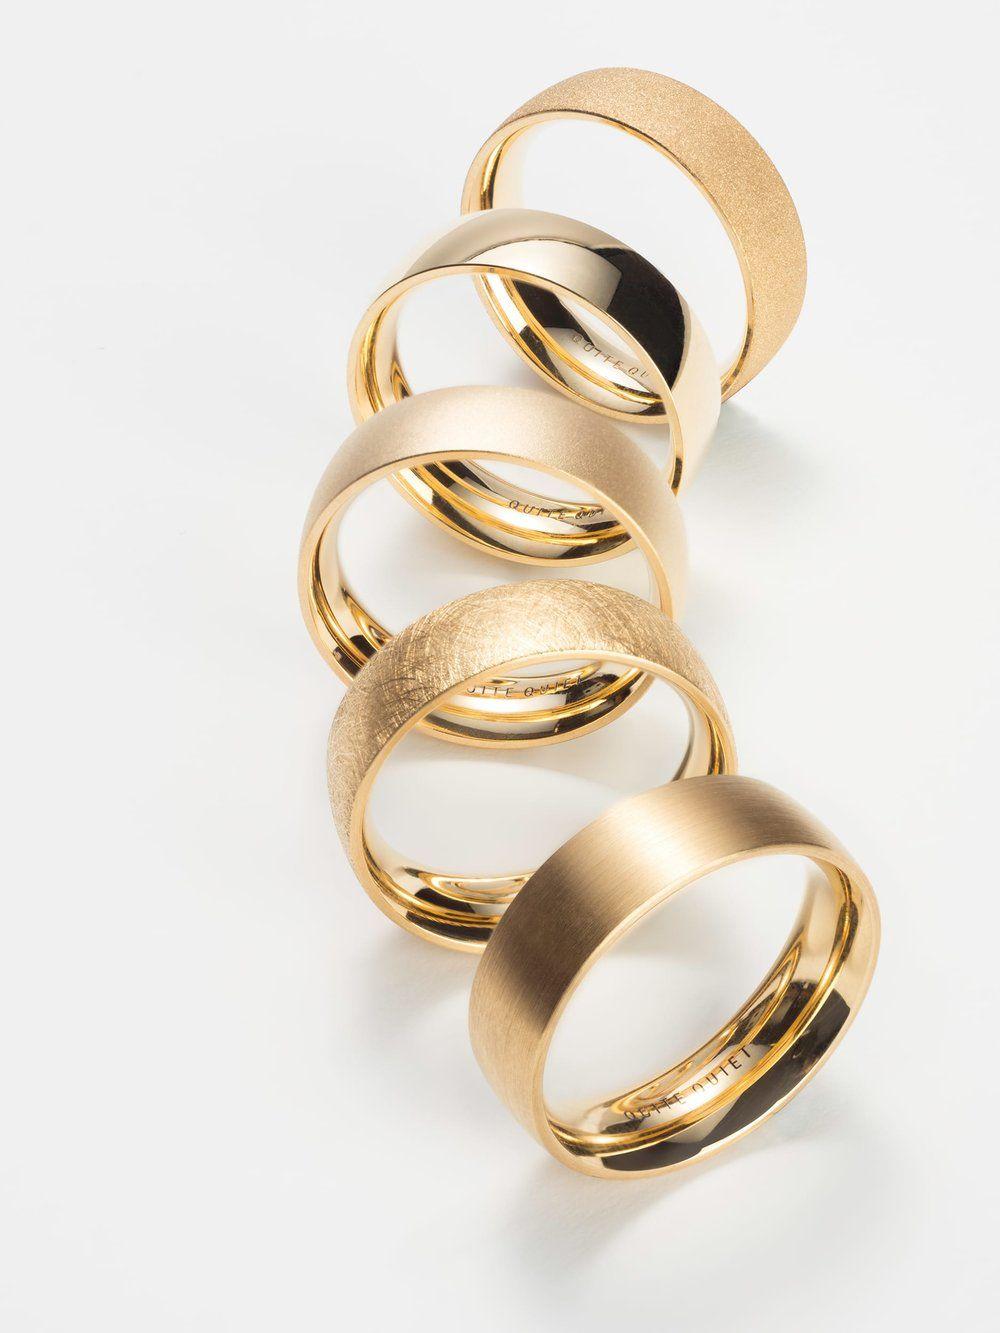 Eheringe in Fairtrade Gold — Quite Quiet Jewelry  Wedding rings